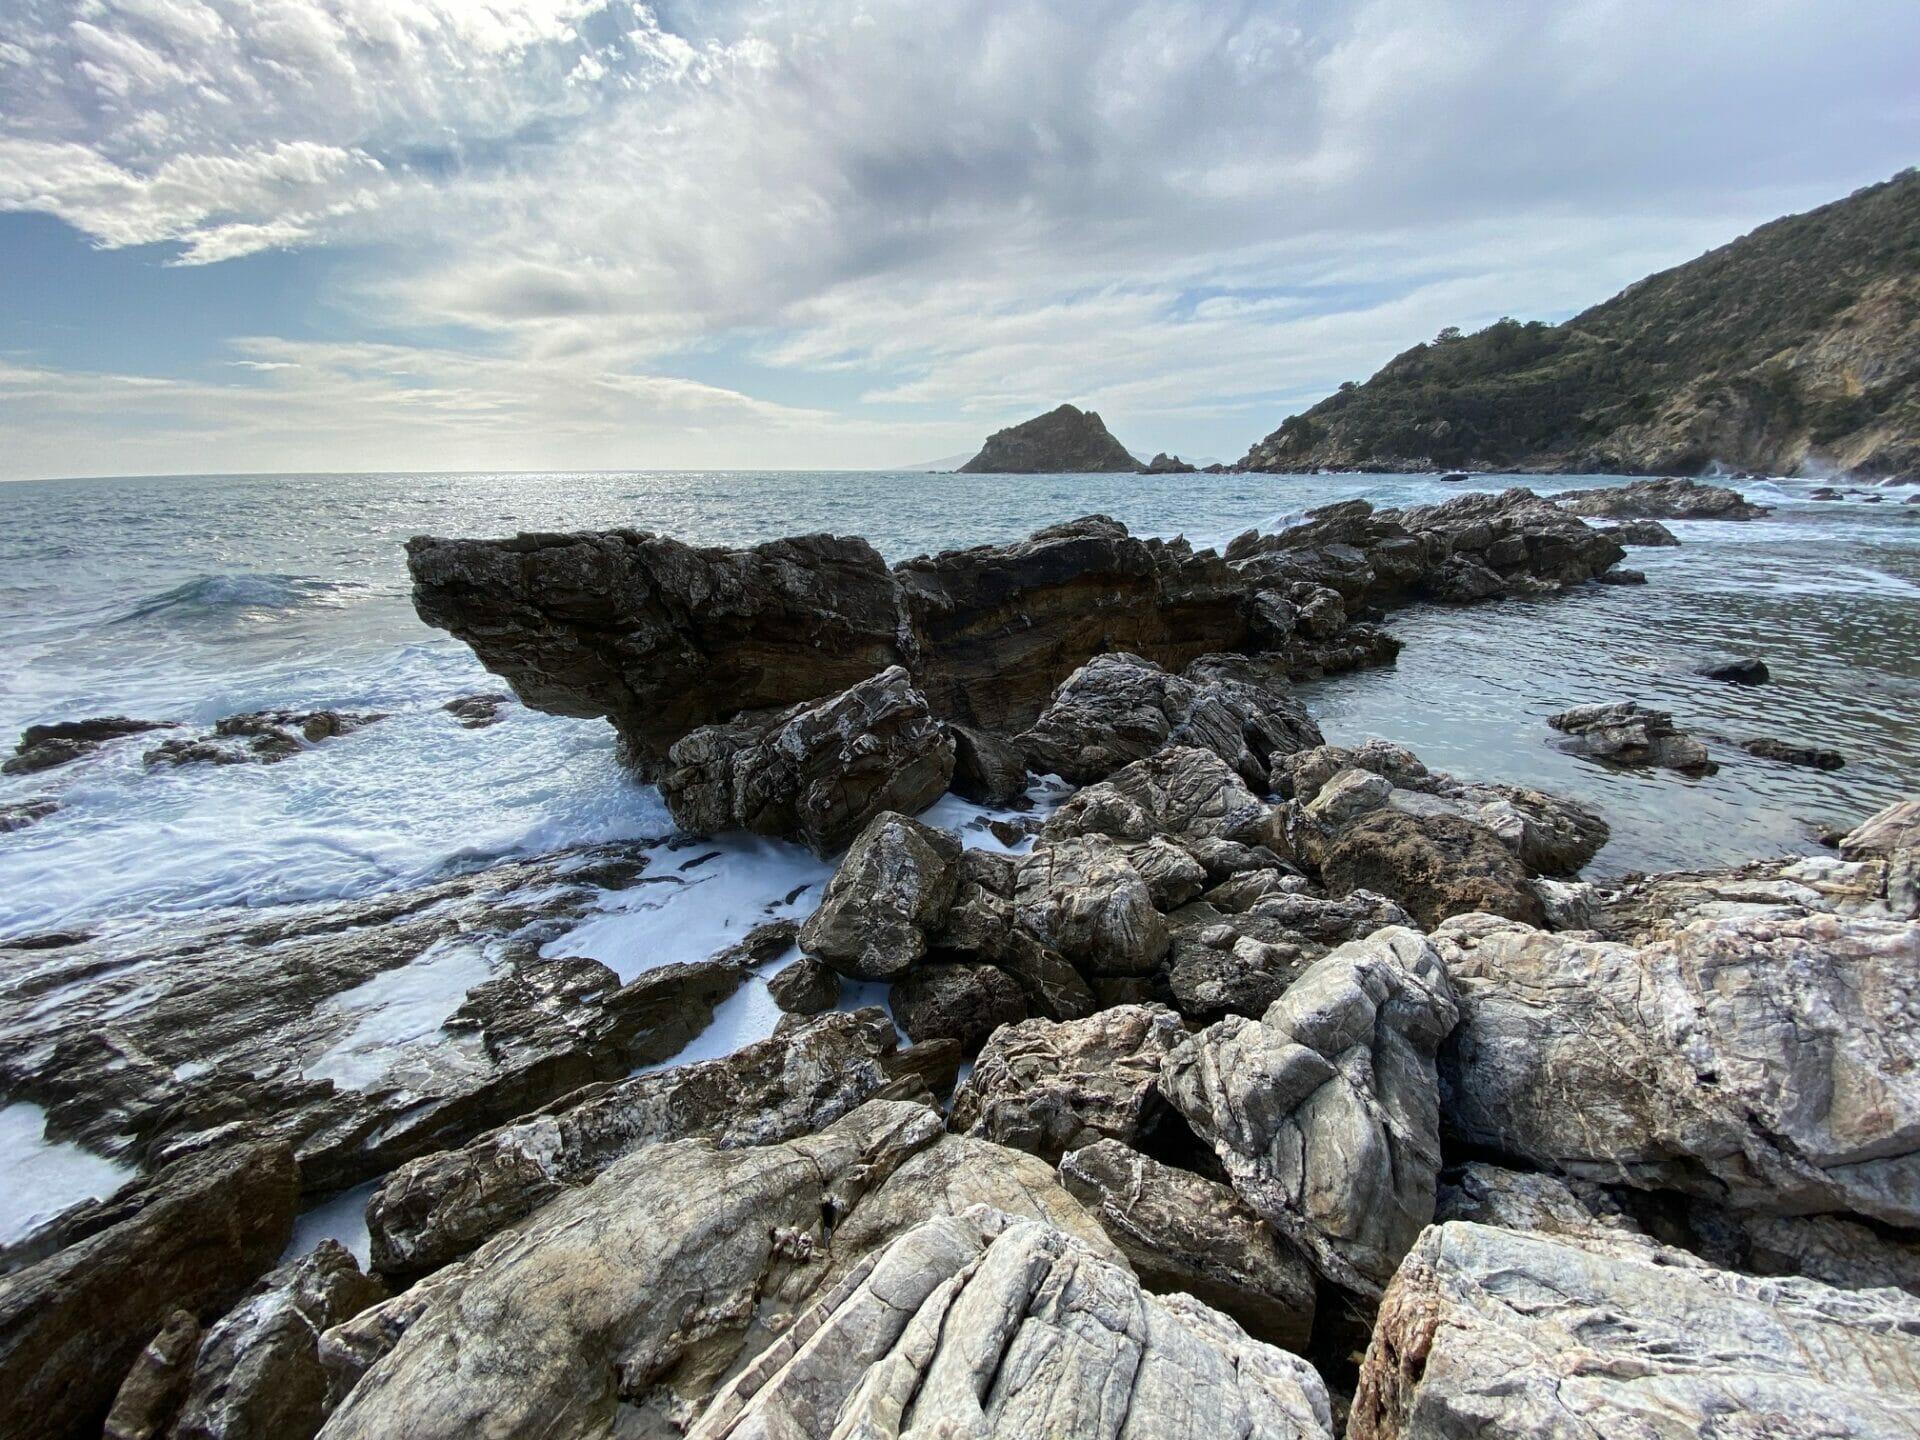 Monte Argentario - Mar Morto (Tuscany)